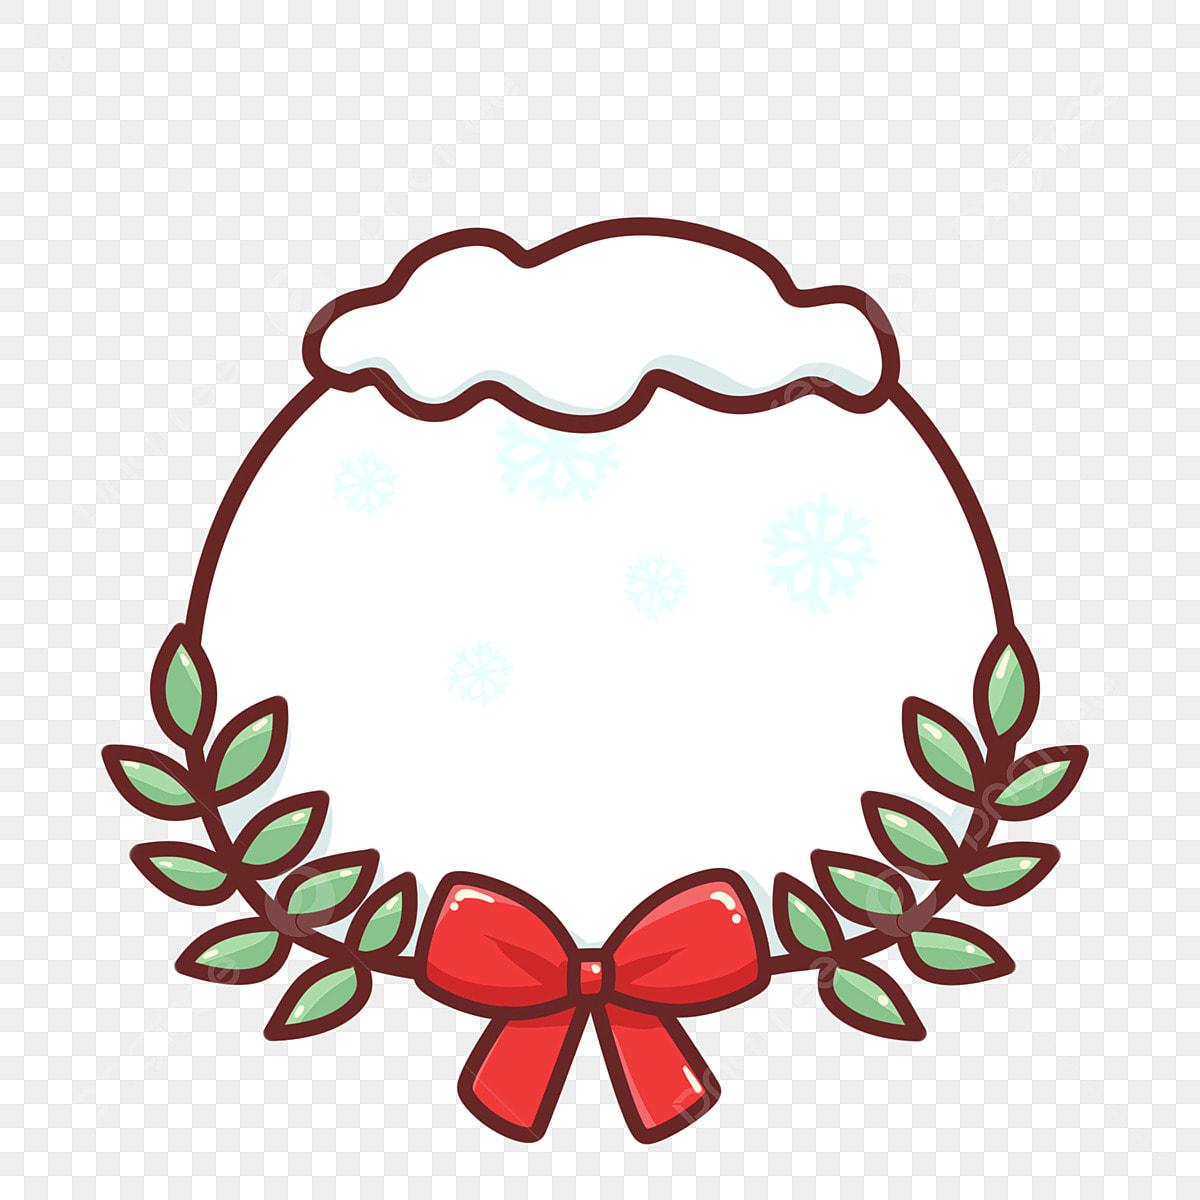 Christmas Header Clipart.Cute Minimalistic Christmas Hand Drawn Border Header